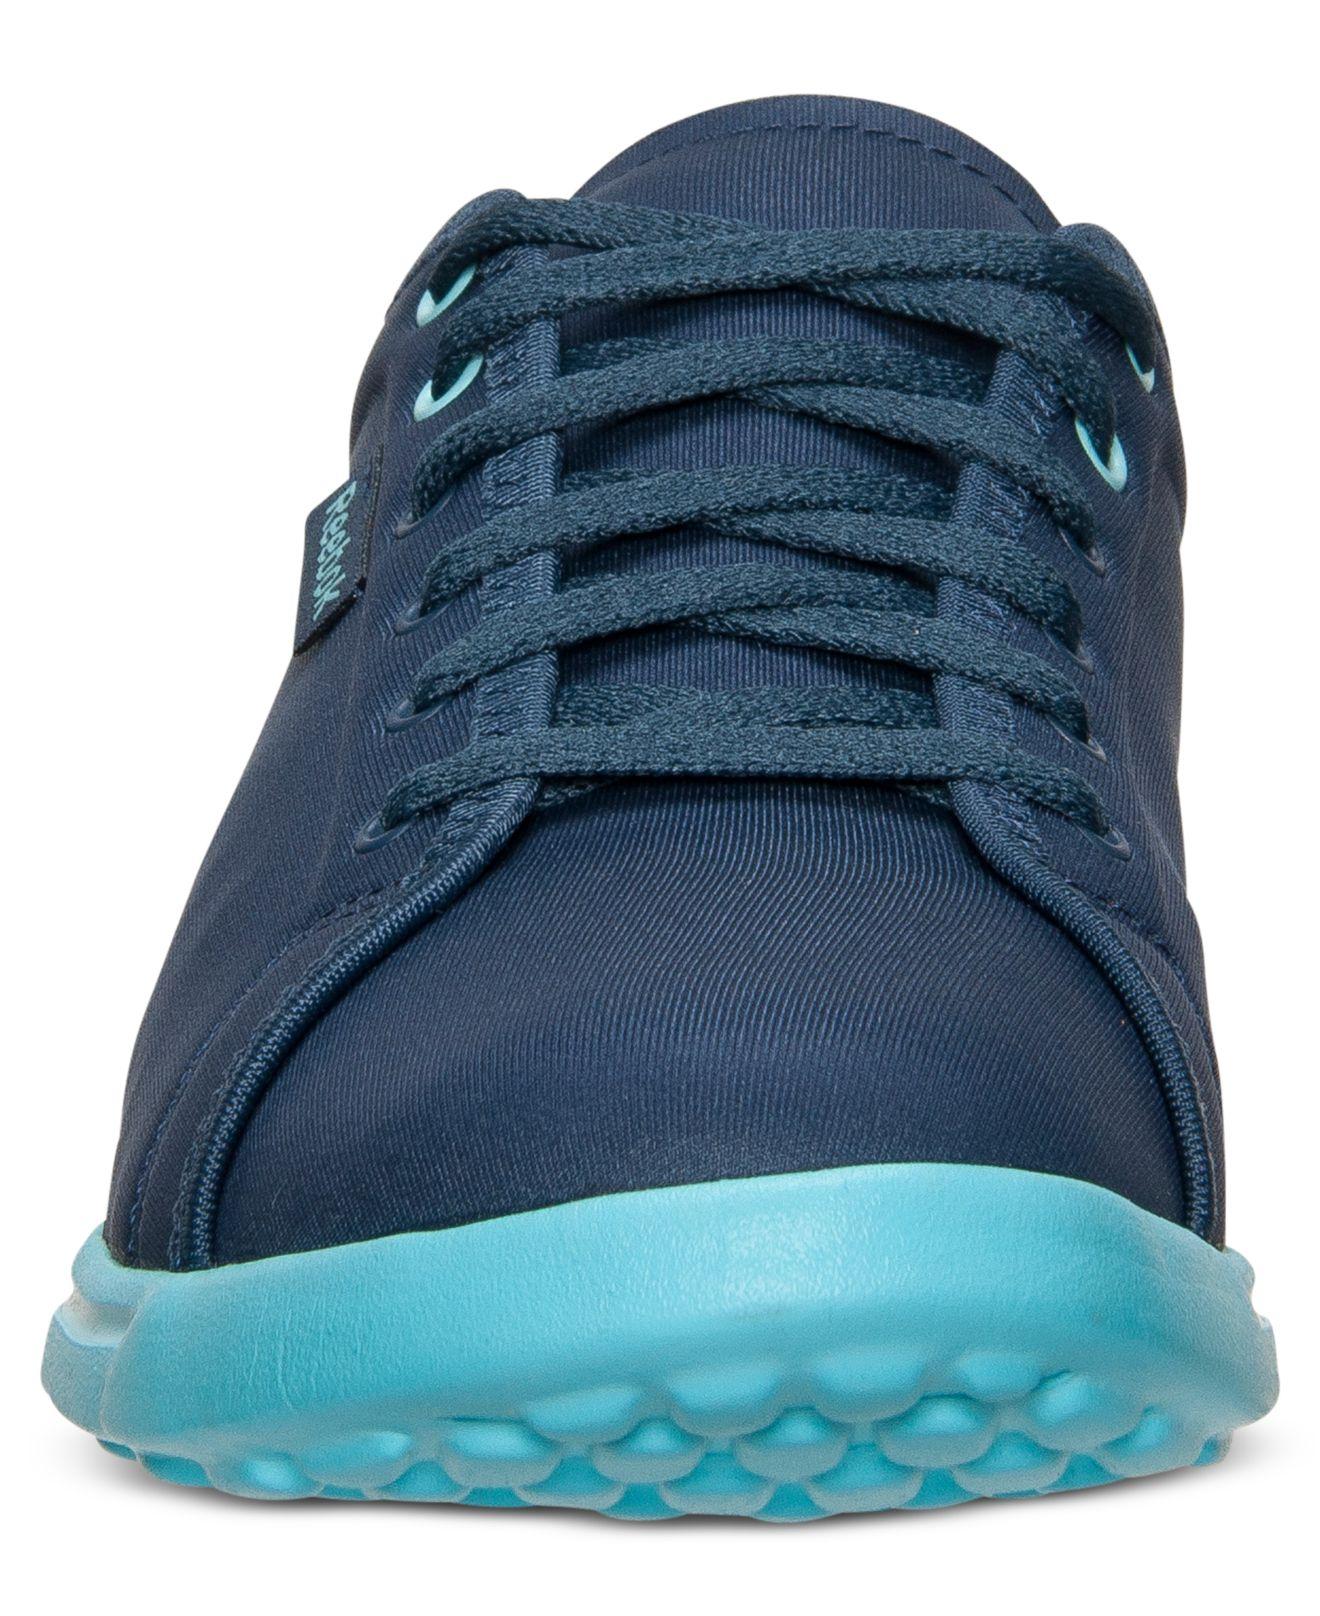 c4aab1c3b2c Lyst - Reebok Women S Skyscape Runaround Walking Sneakers From ...